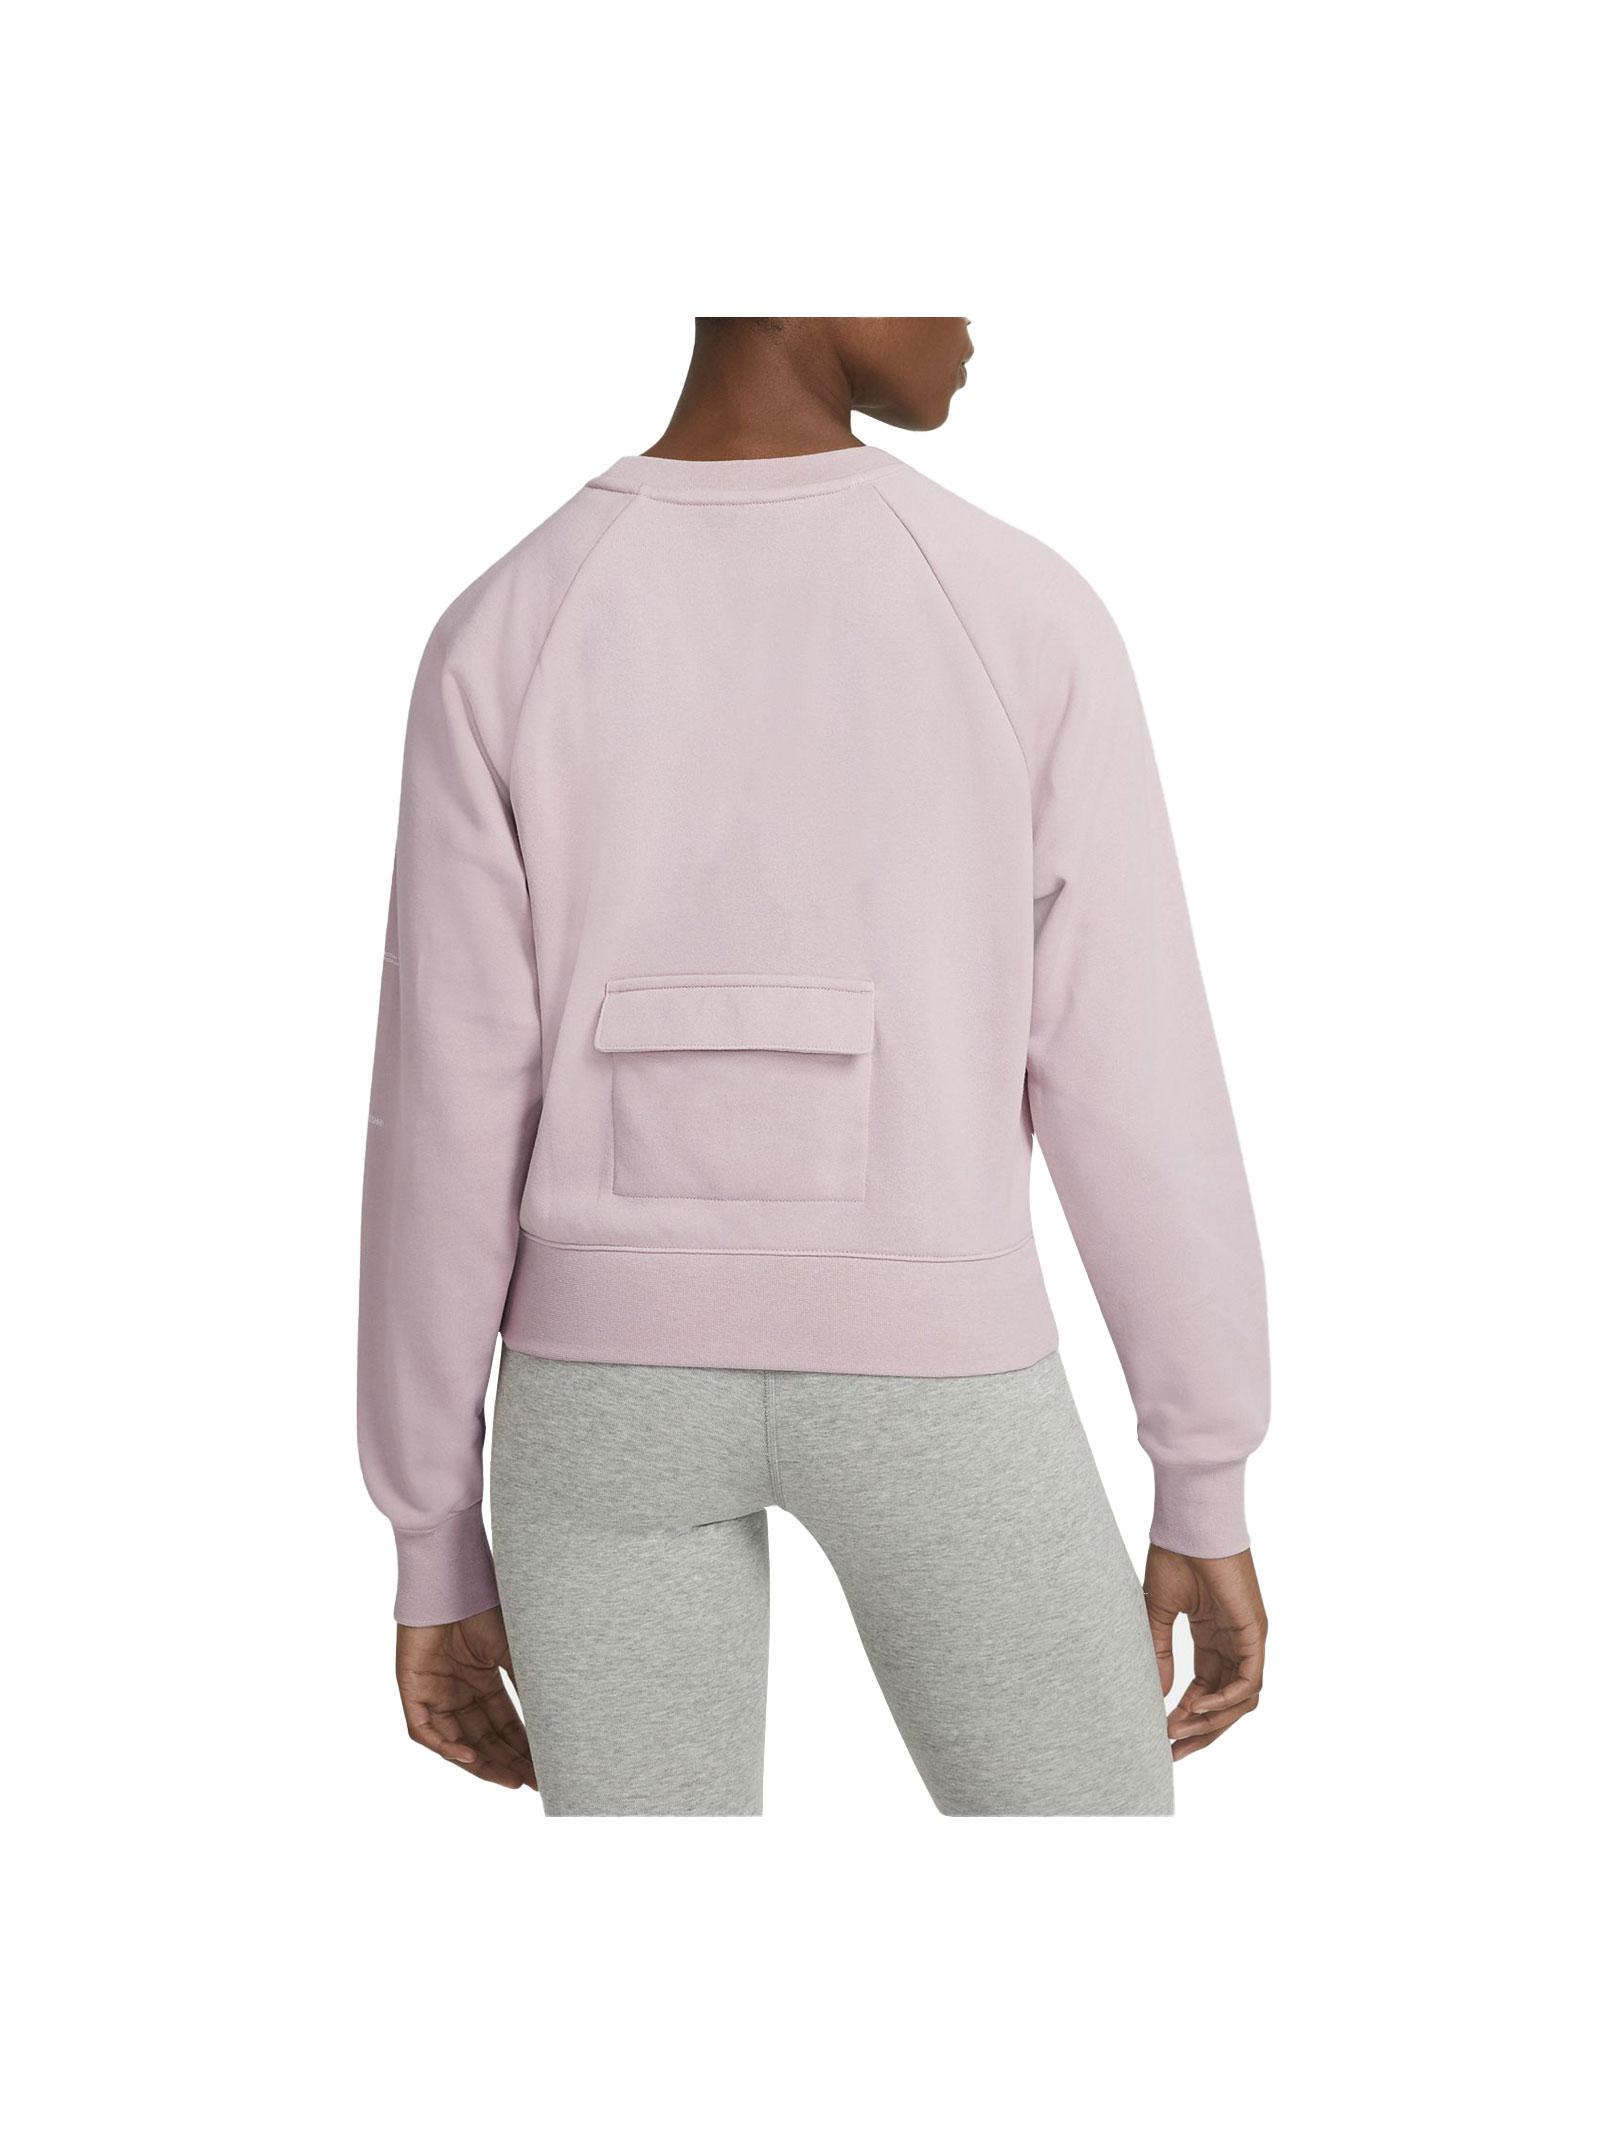 NIKE | Sweatshirts | CZ8890-645